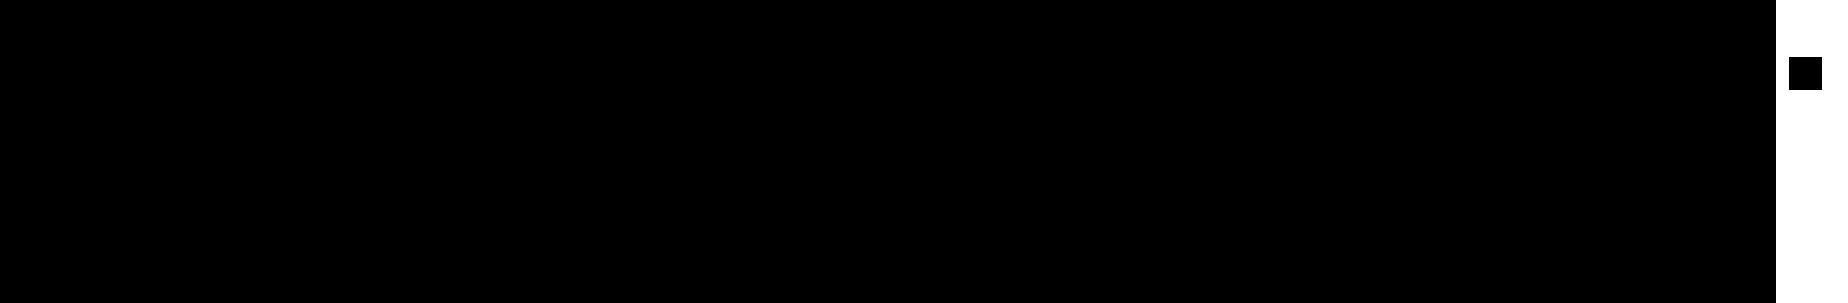 Gm logo blk new